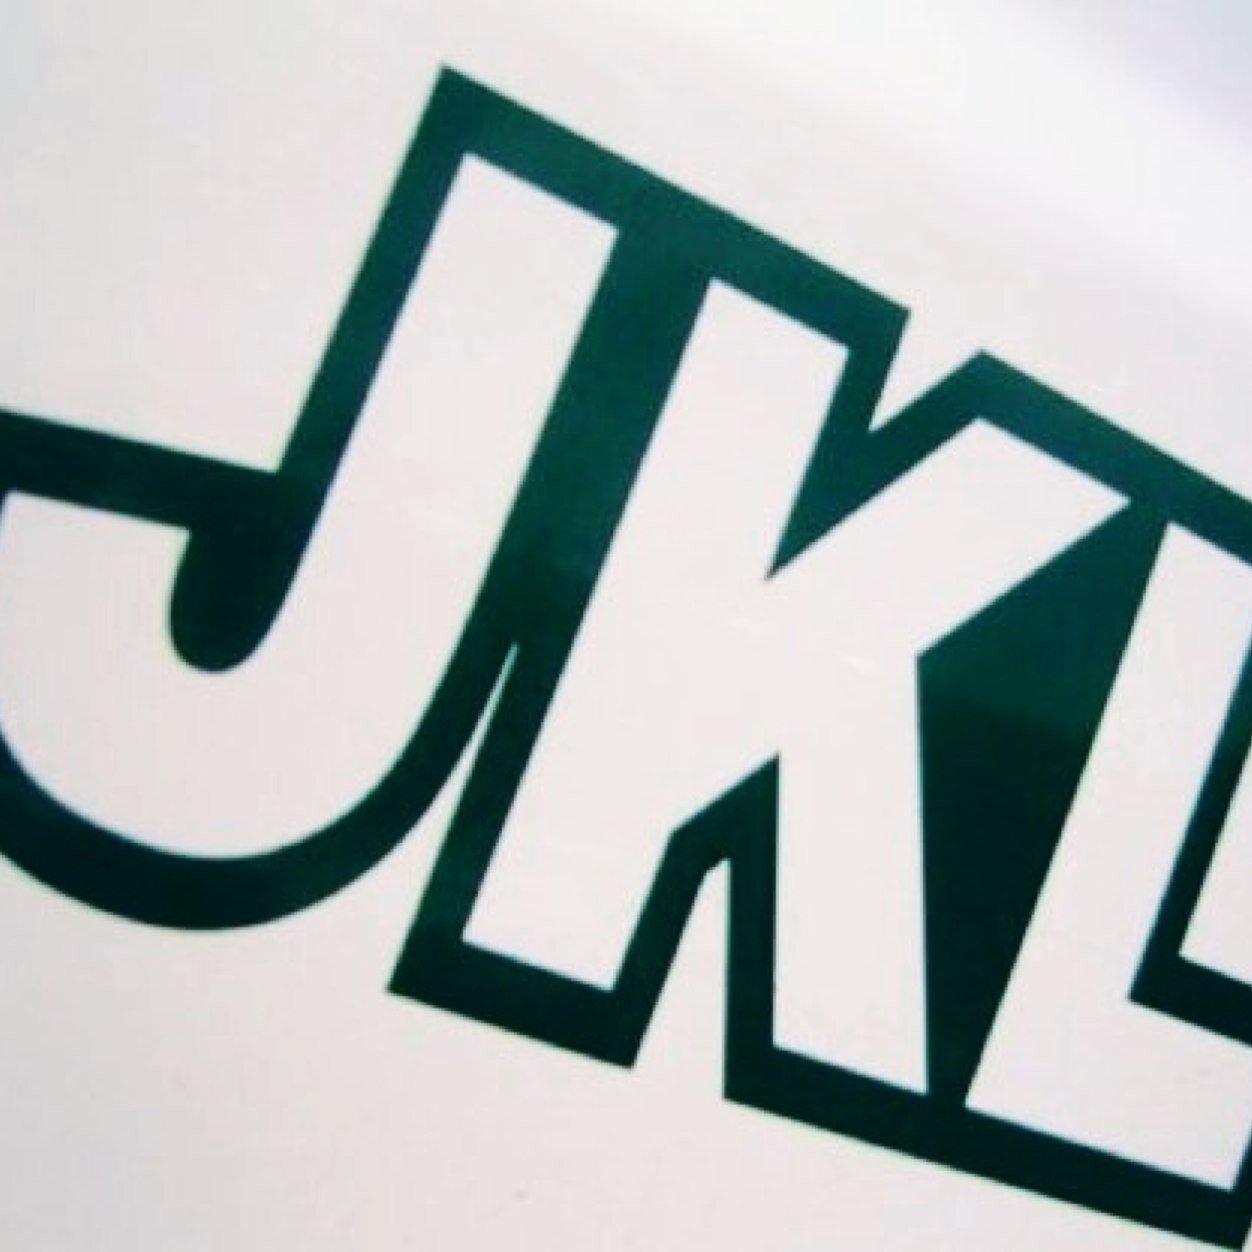 jkk l See photos, tips, similar places specials, and more at jkkl.